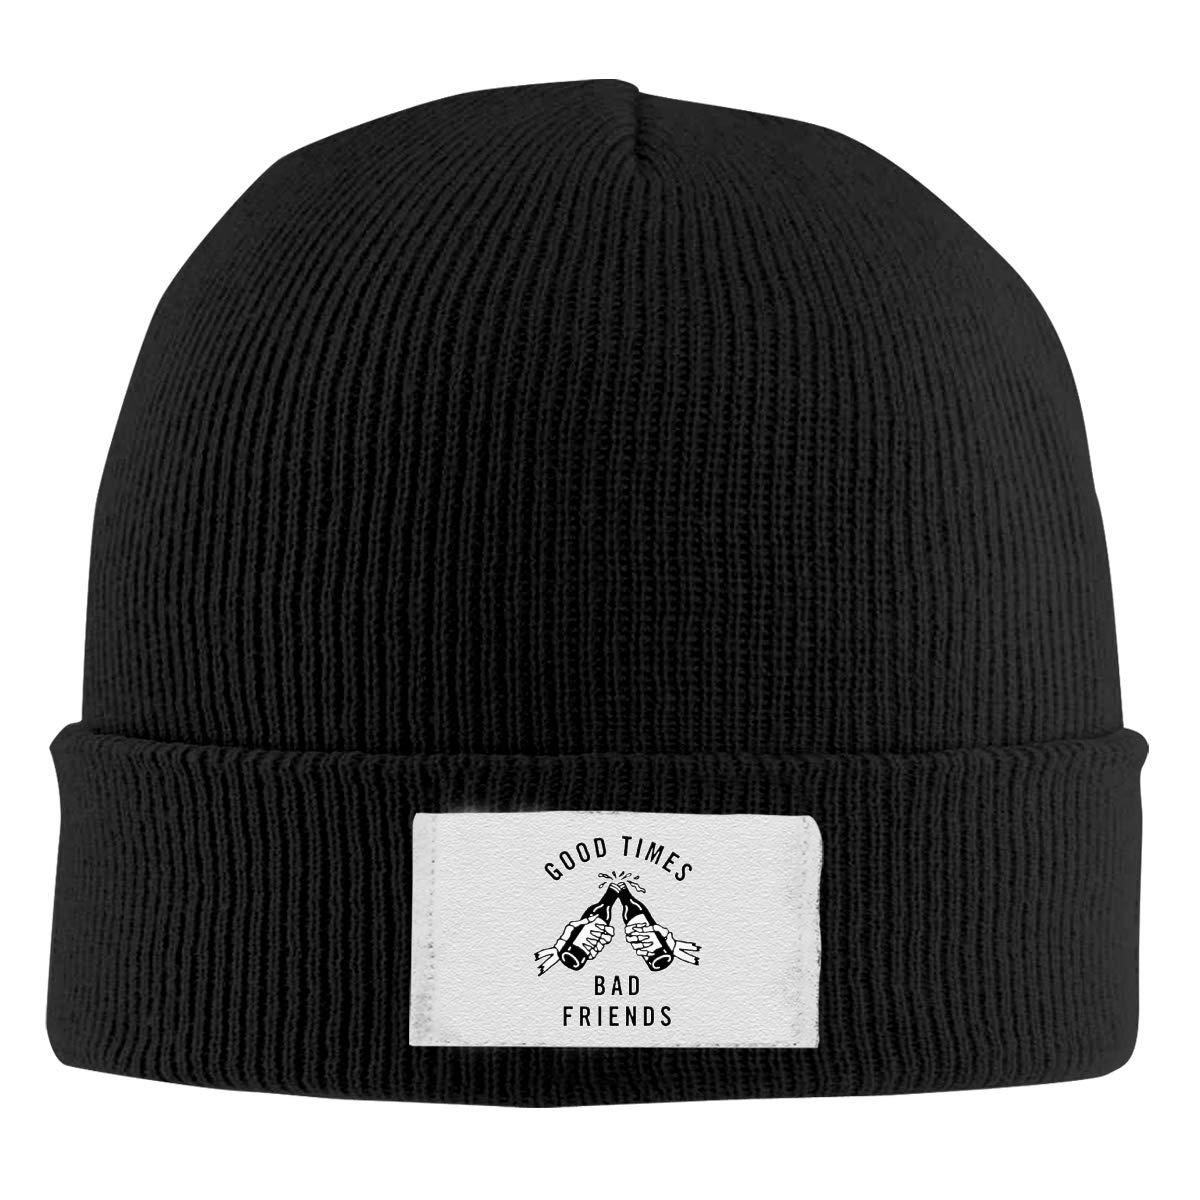 Unisex Stylish Slouch Beanie Hats Black Good Times Bad Friends Top Level Beanie Men Women